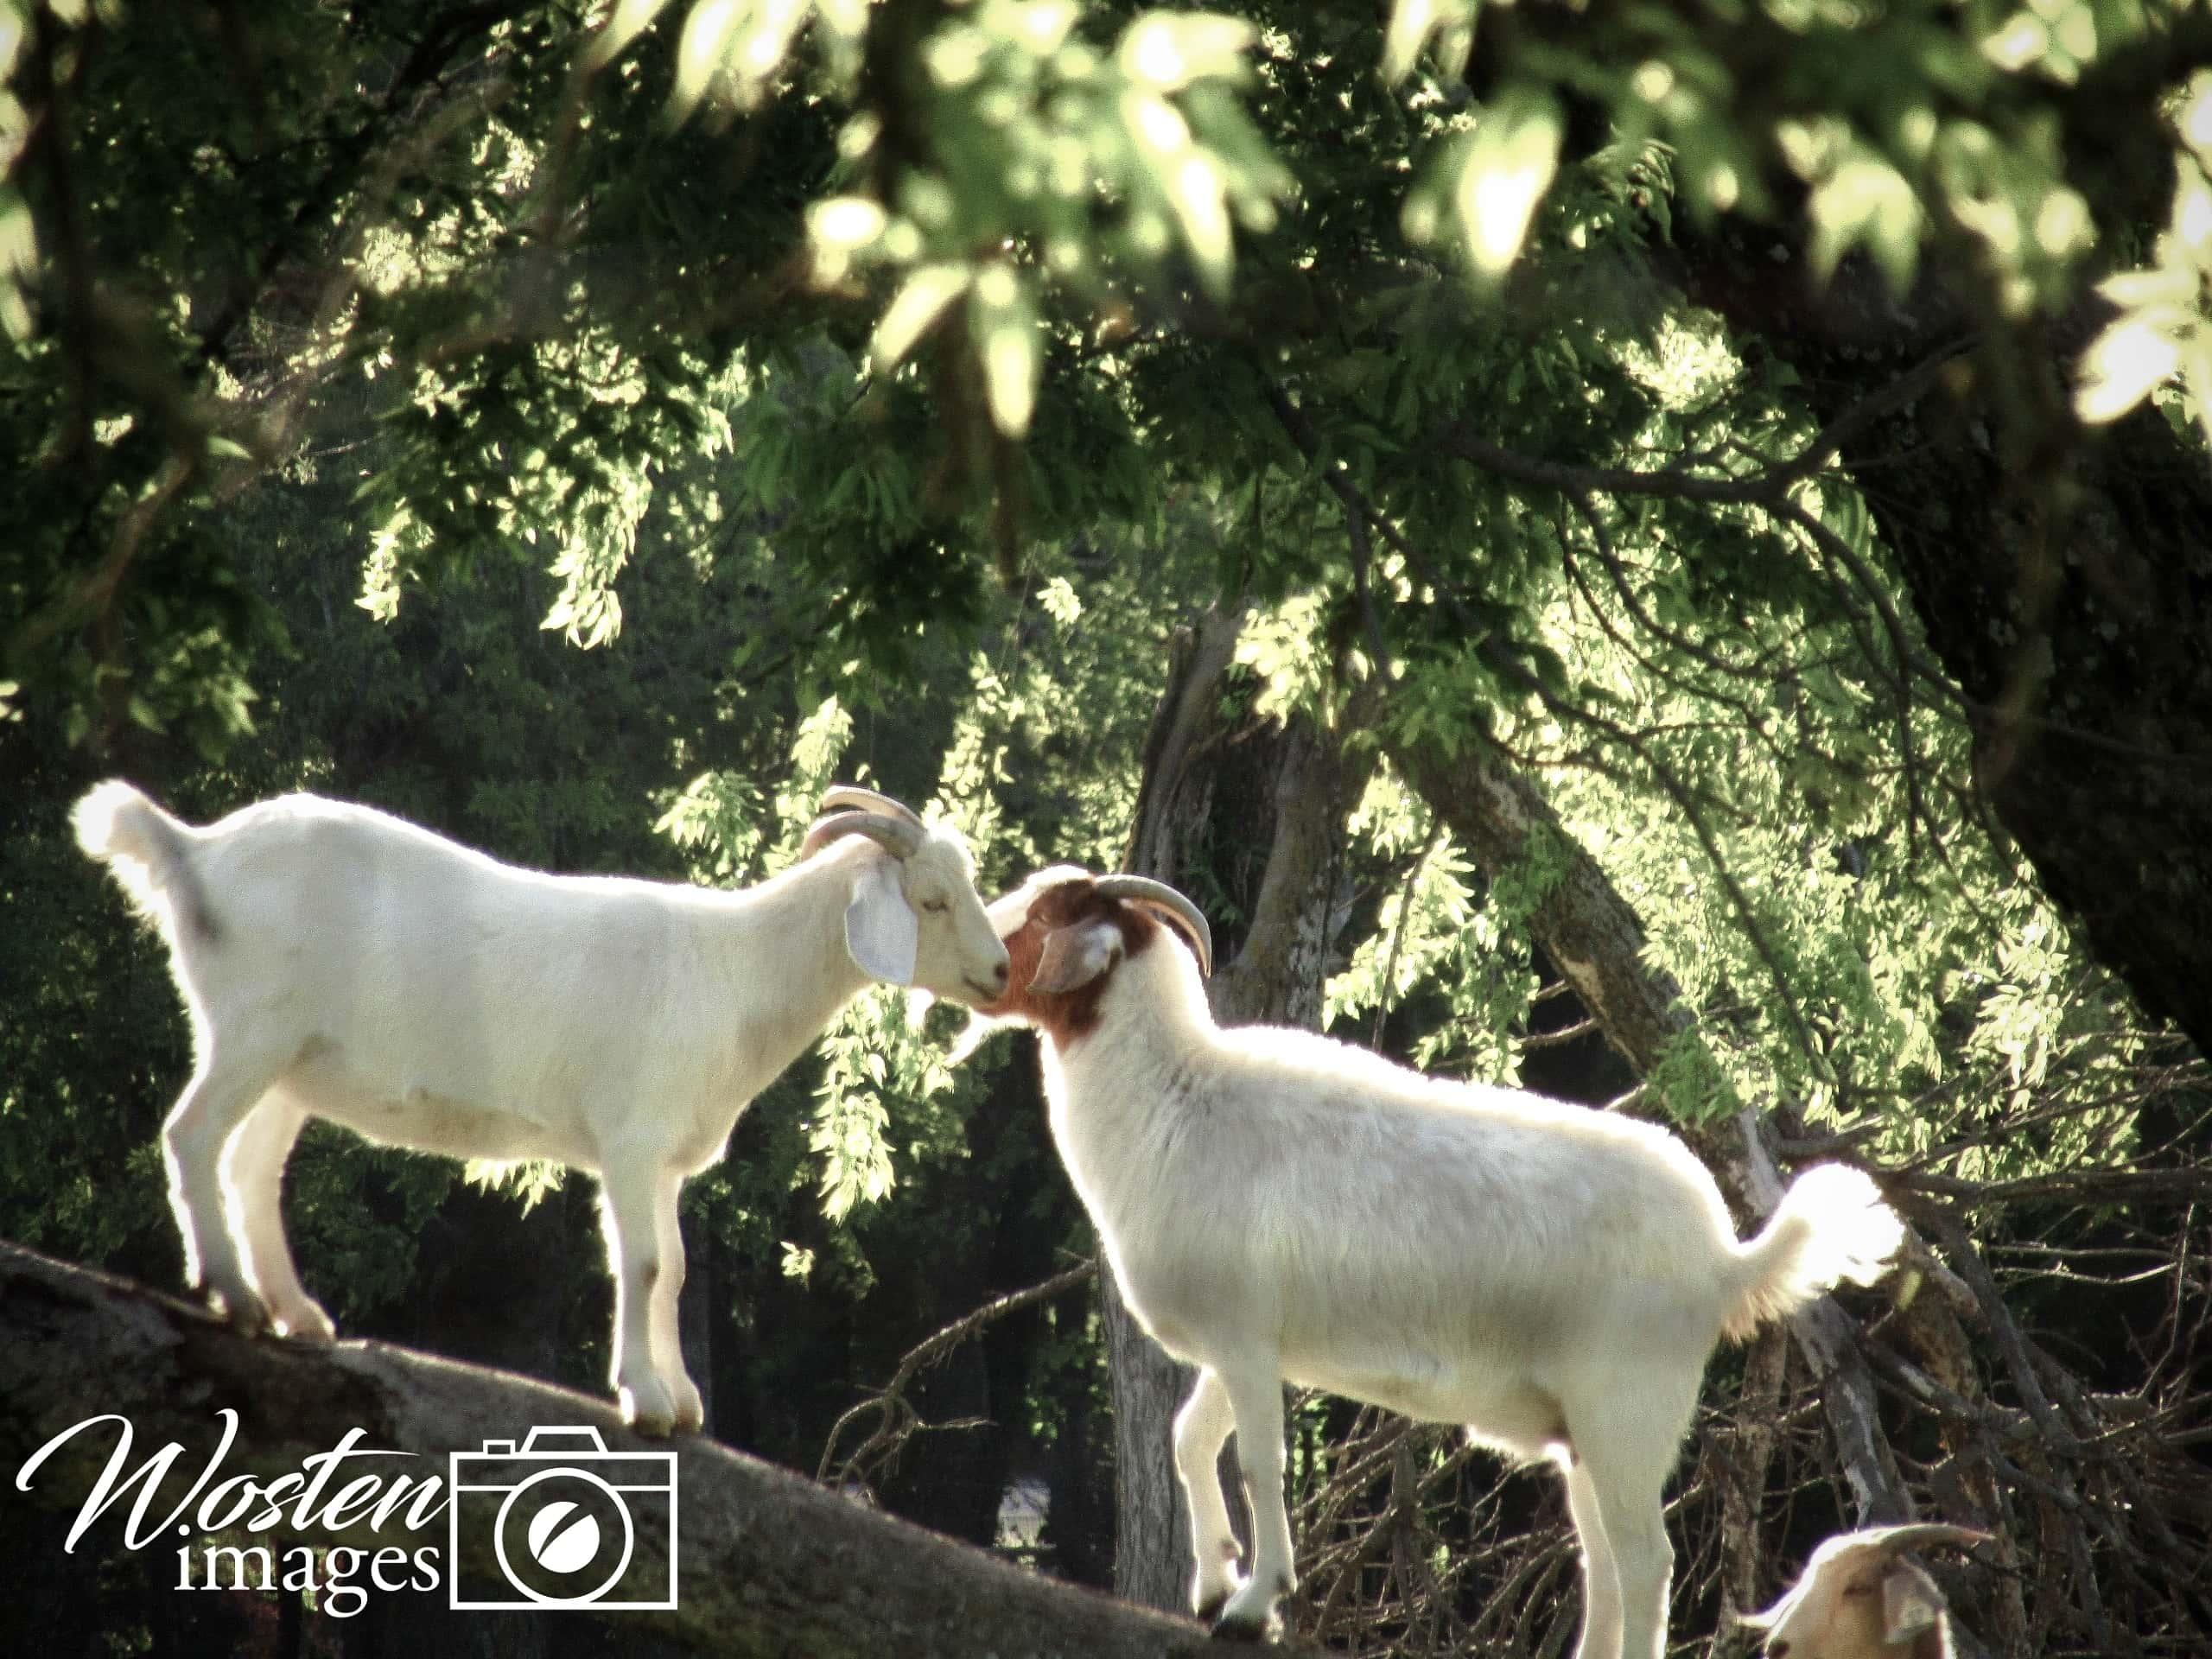 goats on a tree limb